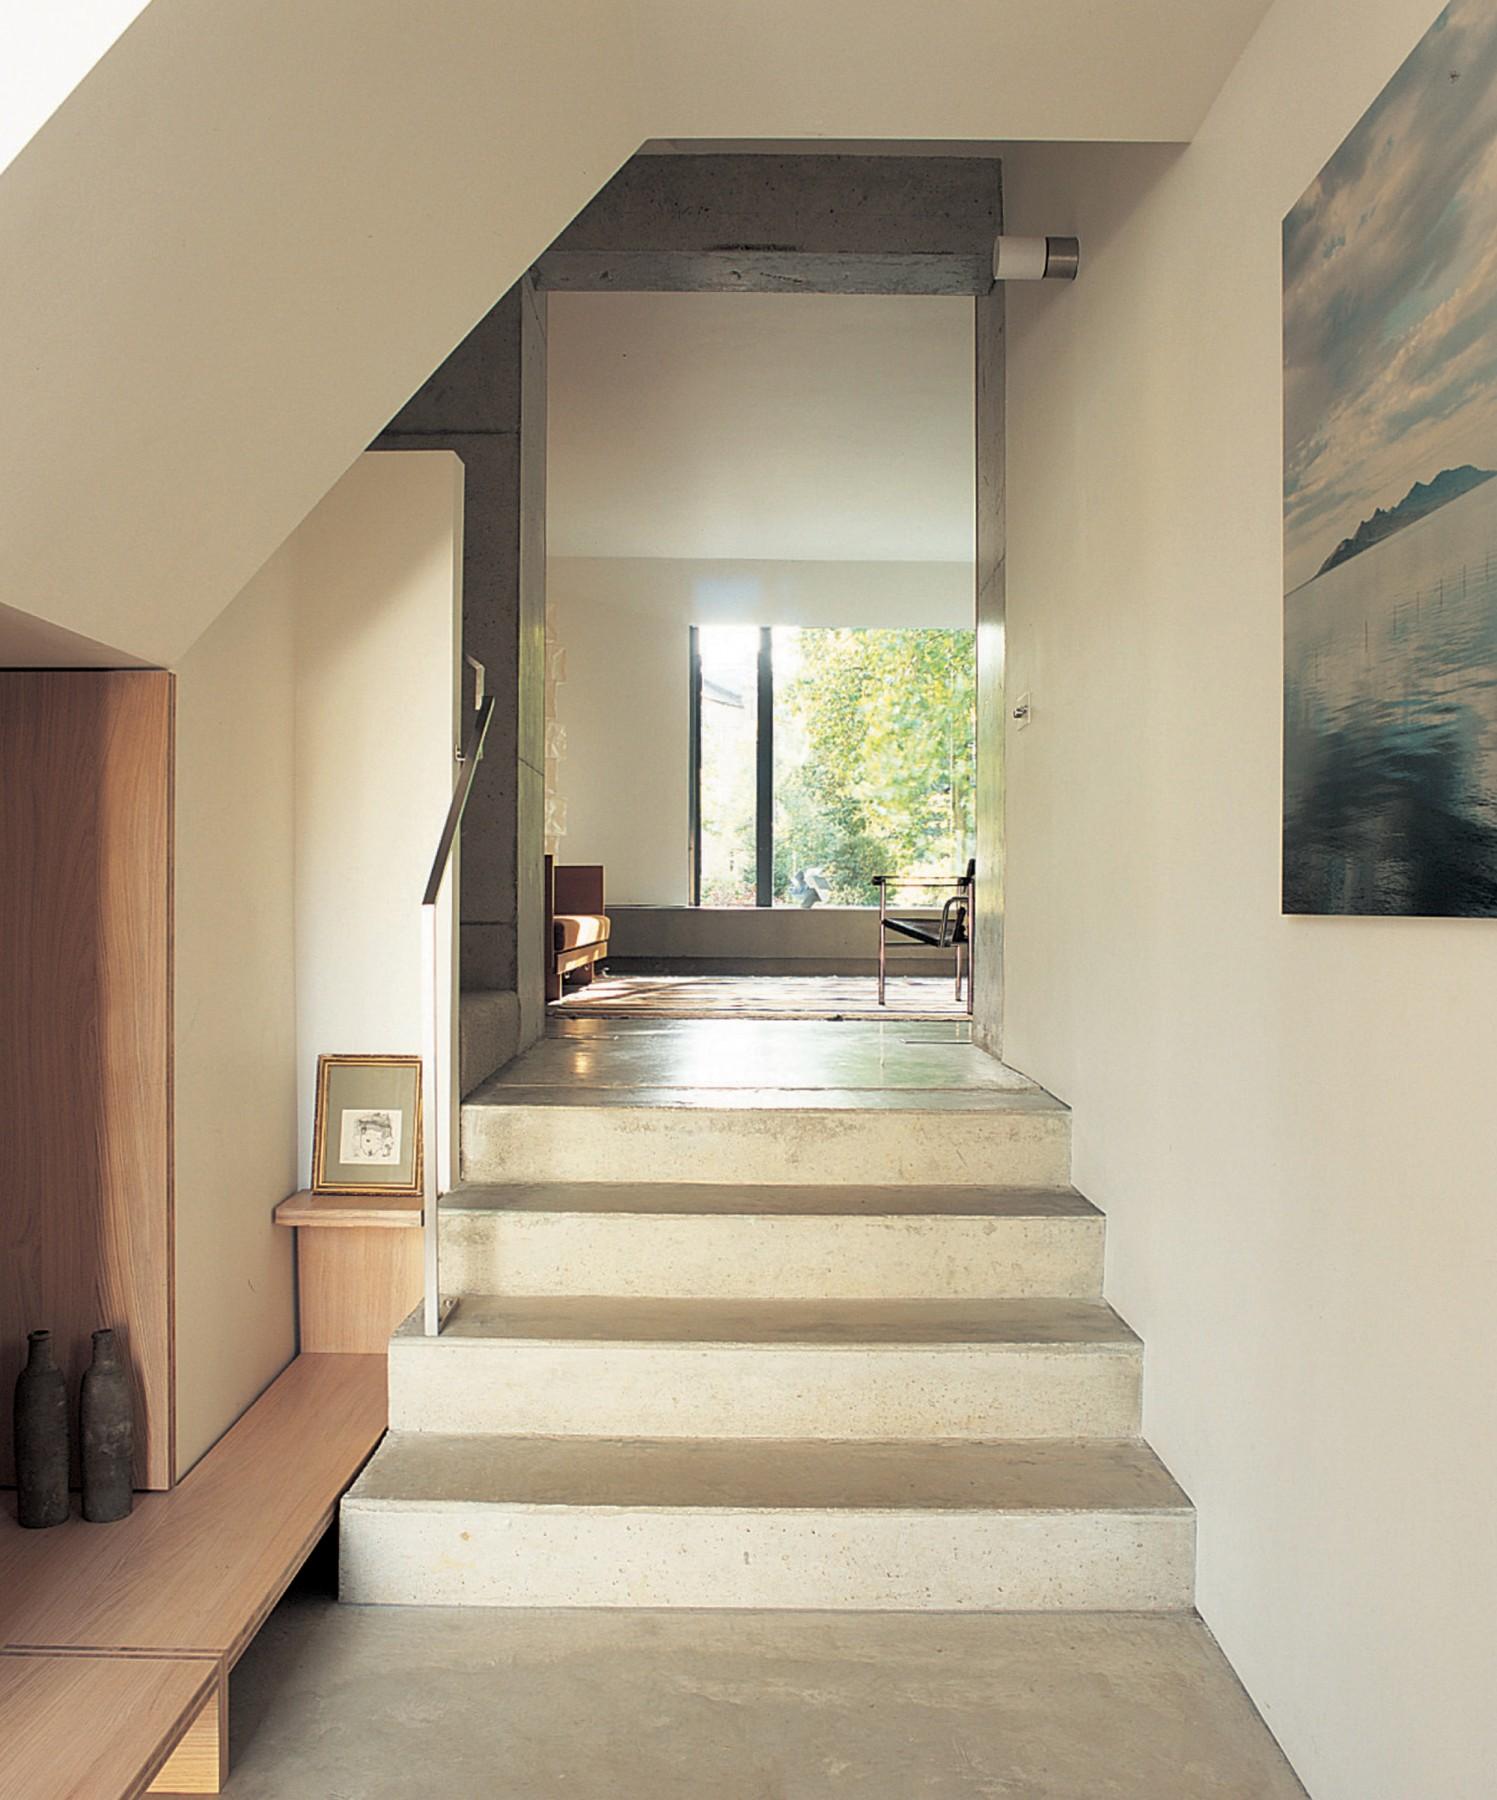 Kander-house-Primrose-hill-London-residential-home-contemporary-interior-Riba-award-victorian-Jamie-Fobert-Architects-6